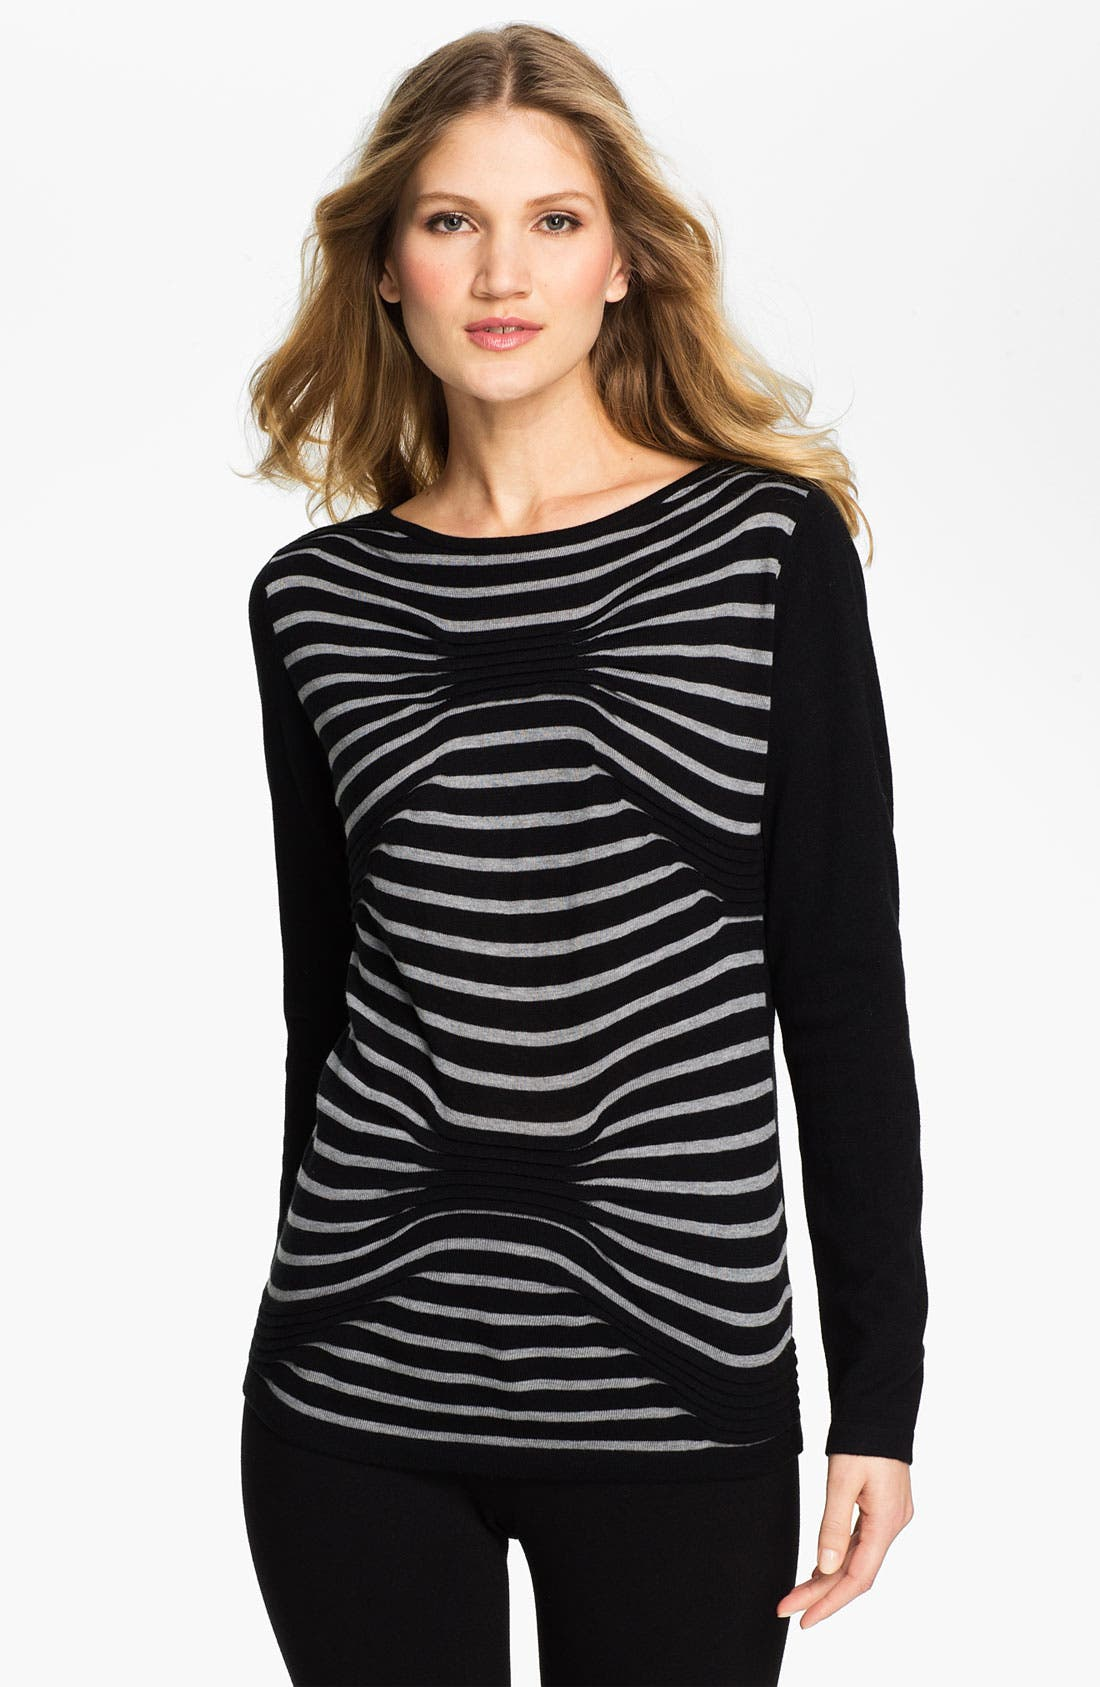 Alternate Image 1 Selected - Beatrix Ost Stripe & Pleat Sweater (Online Exclusive)